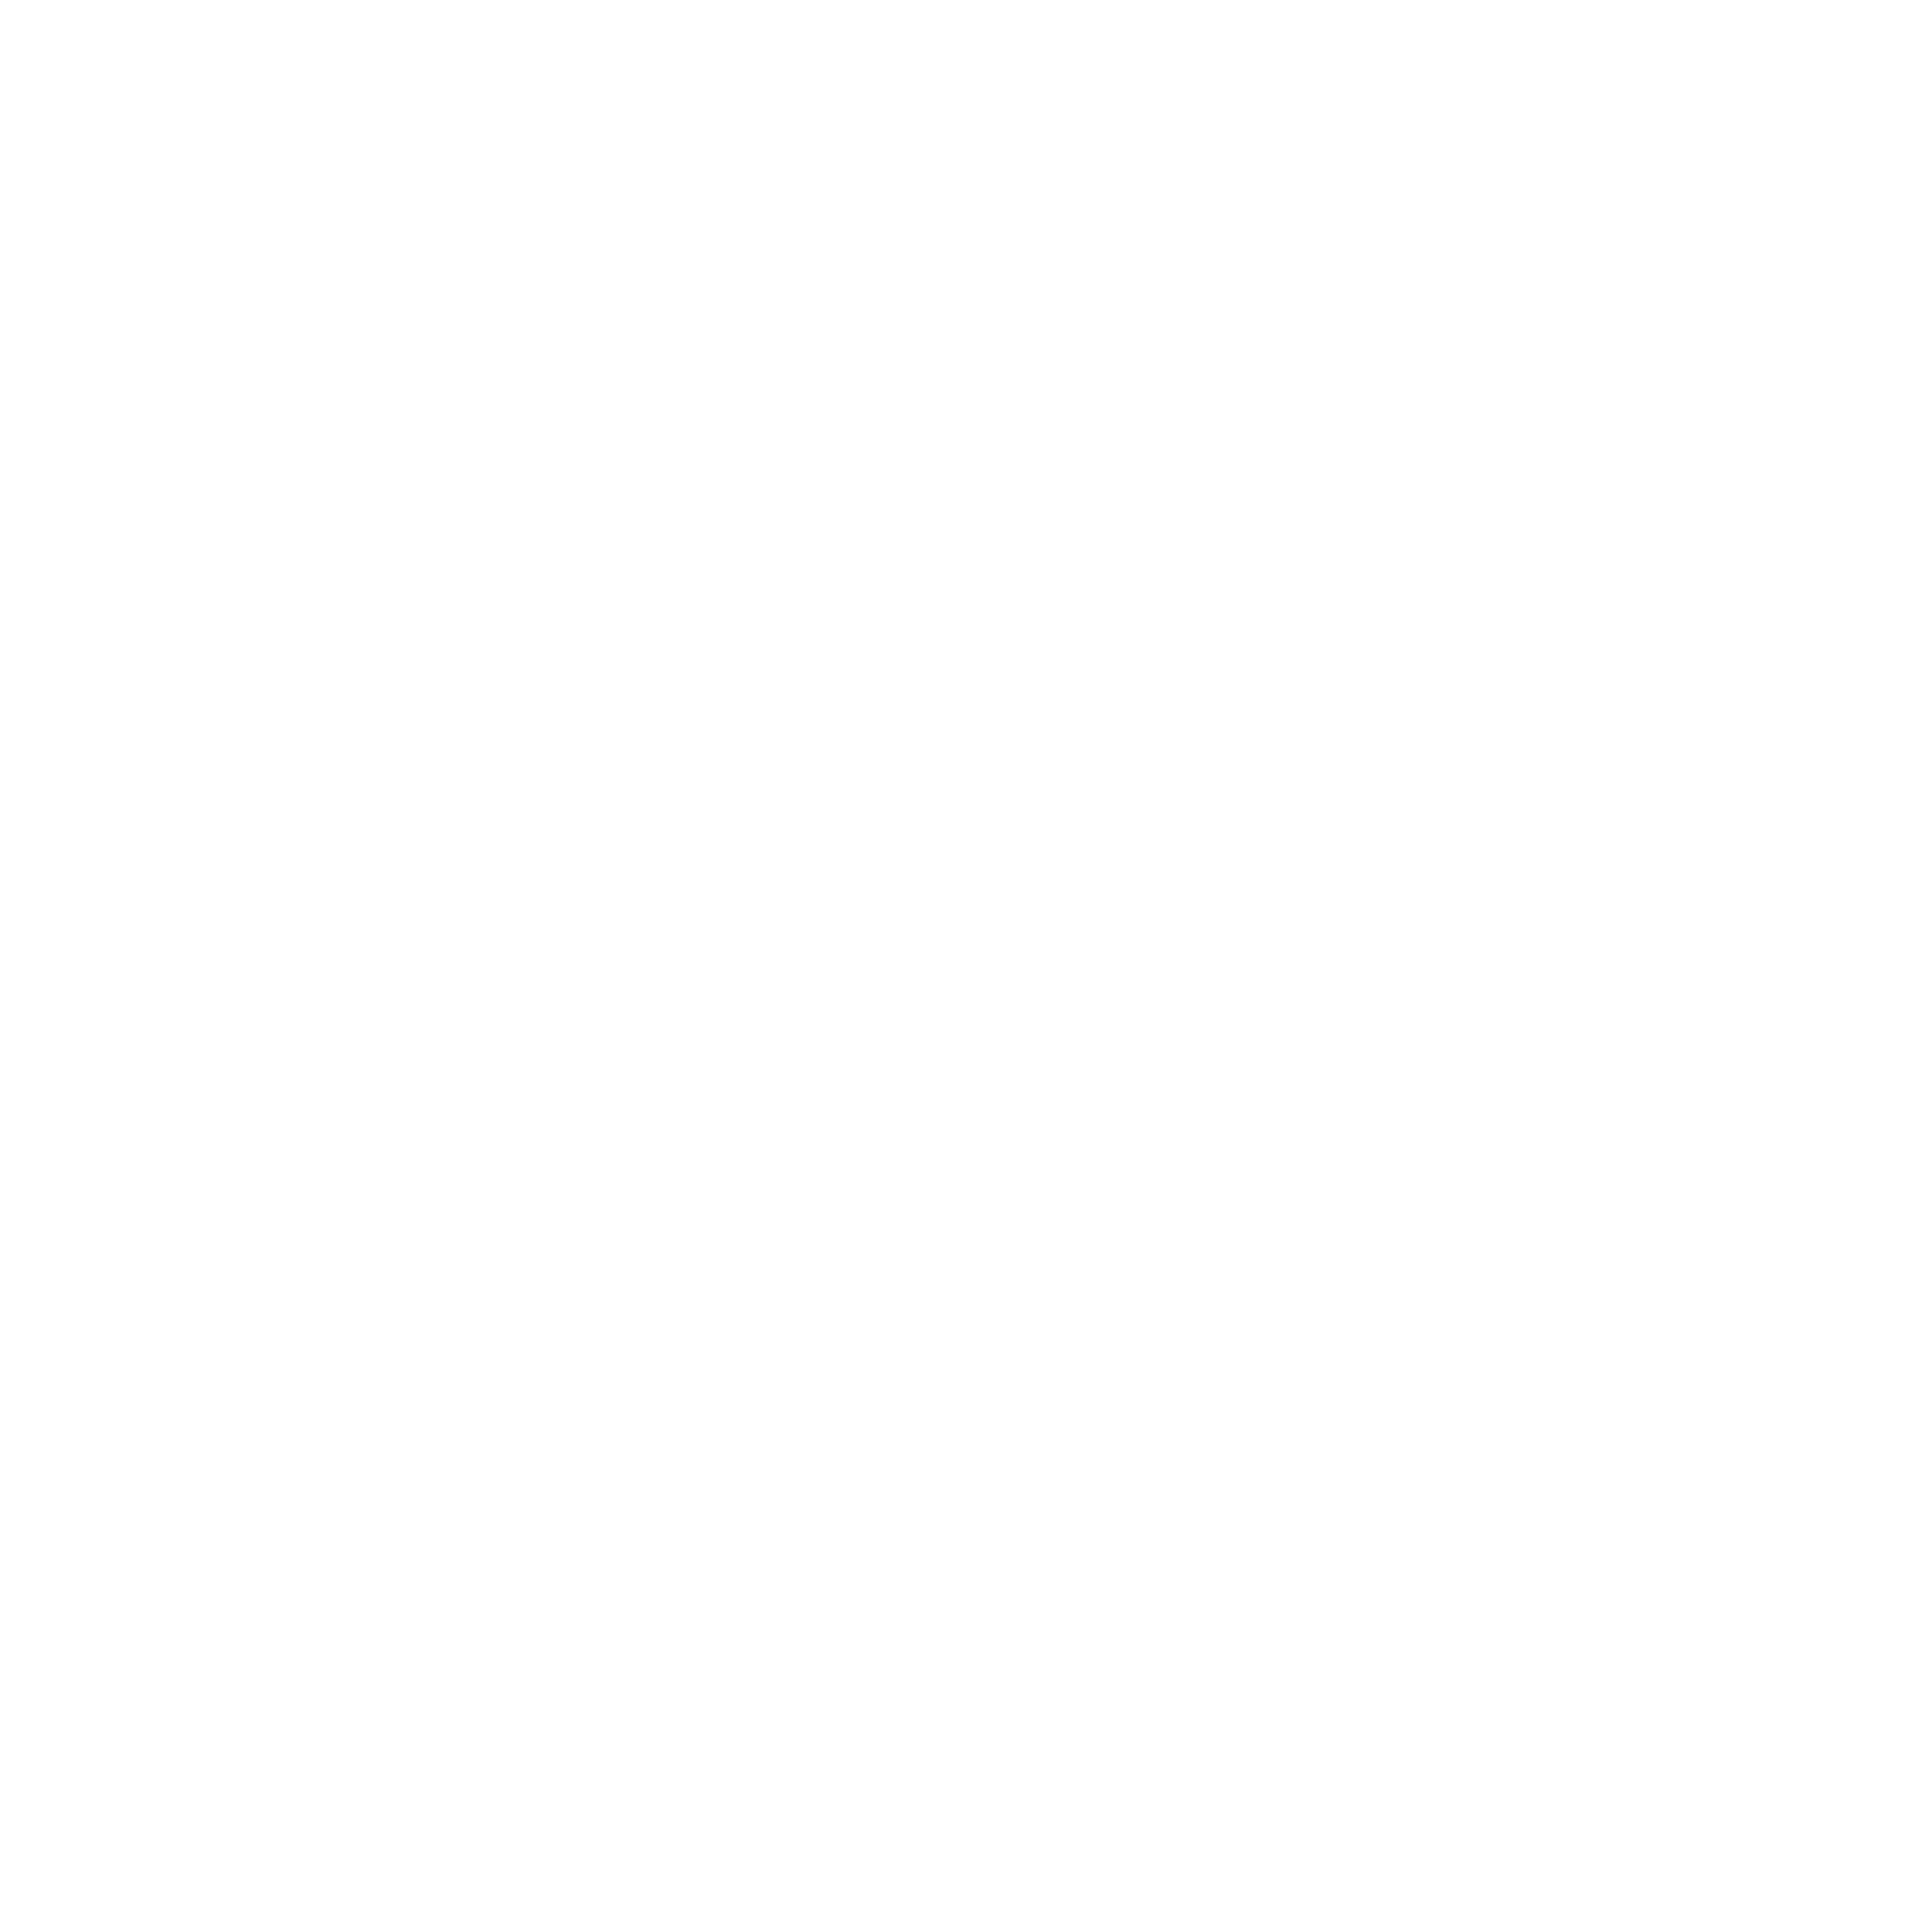 Jean-denis blanc